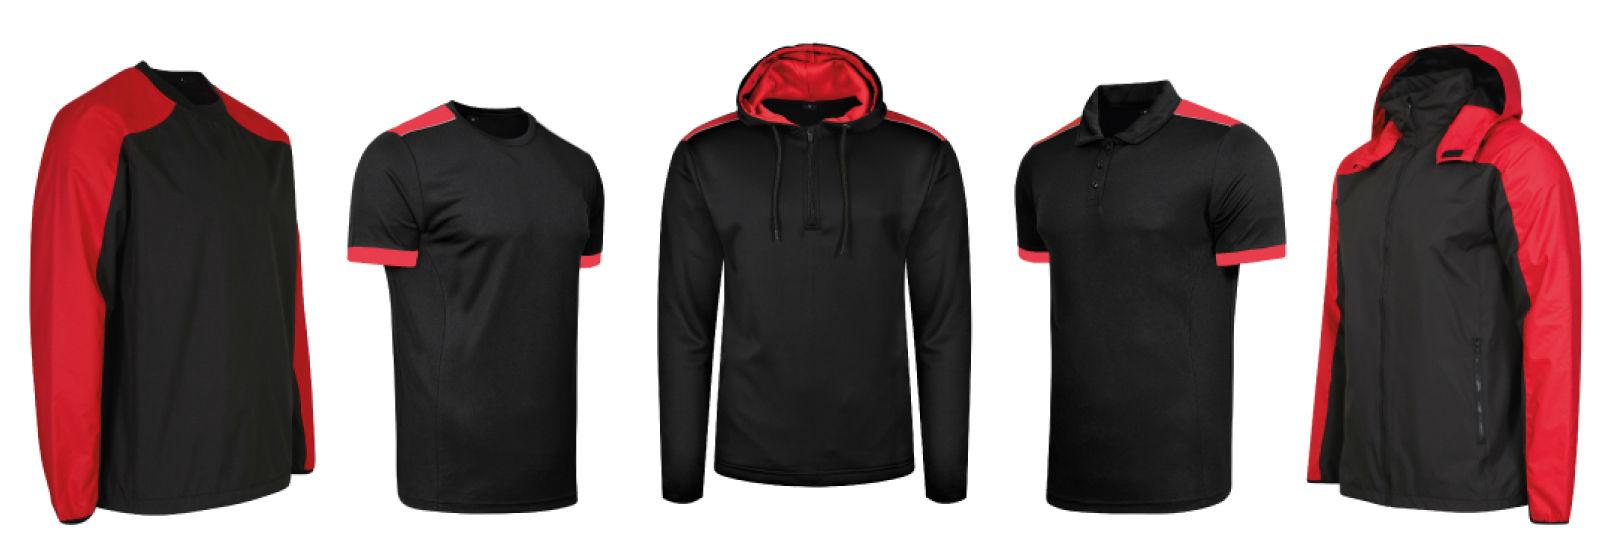 Colour coordinated team kit